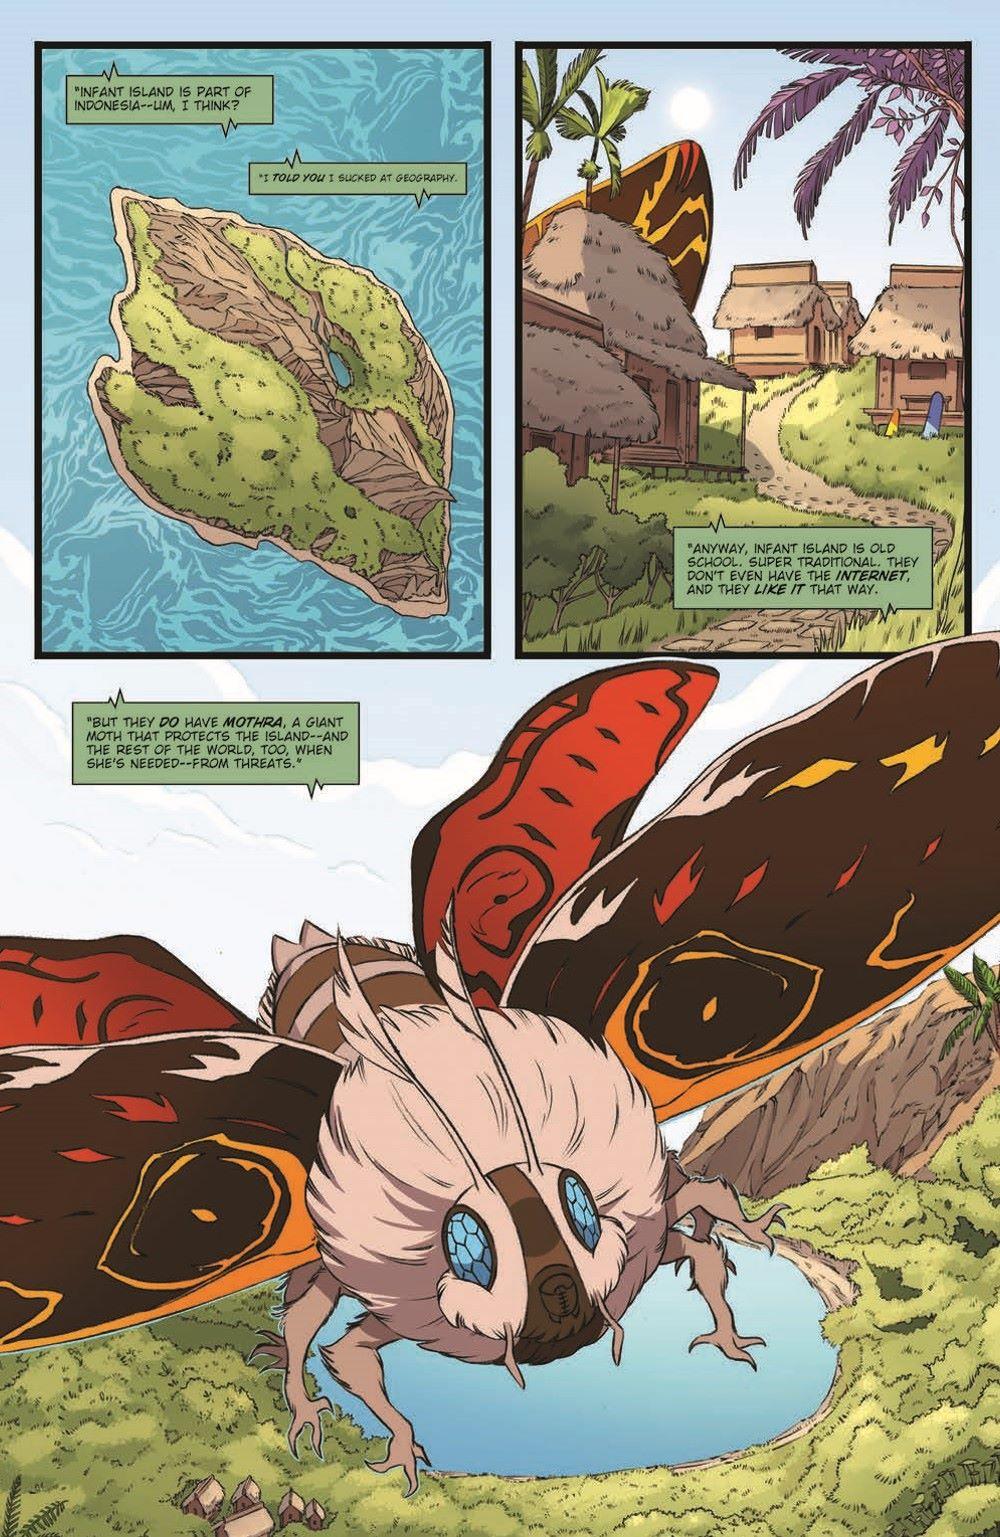 Godzilla_MnP_02_pr-4 ComicList Previews: GODZILLA MONSTERS AND PROTECTORS #2 (OF 5)